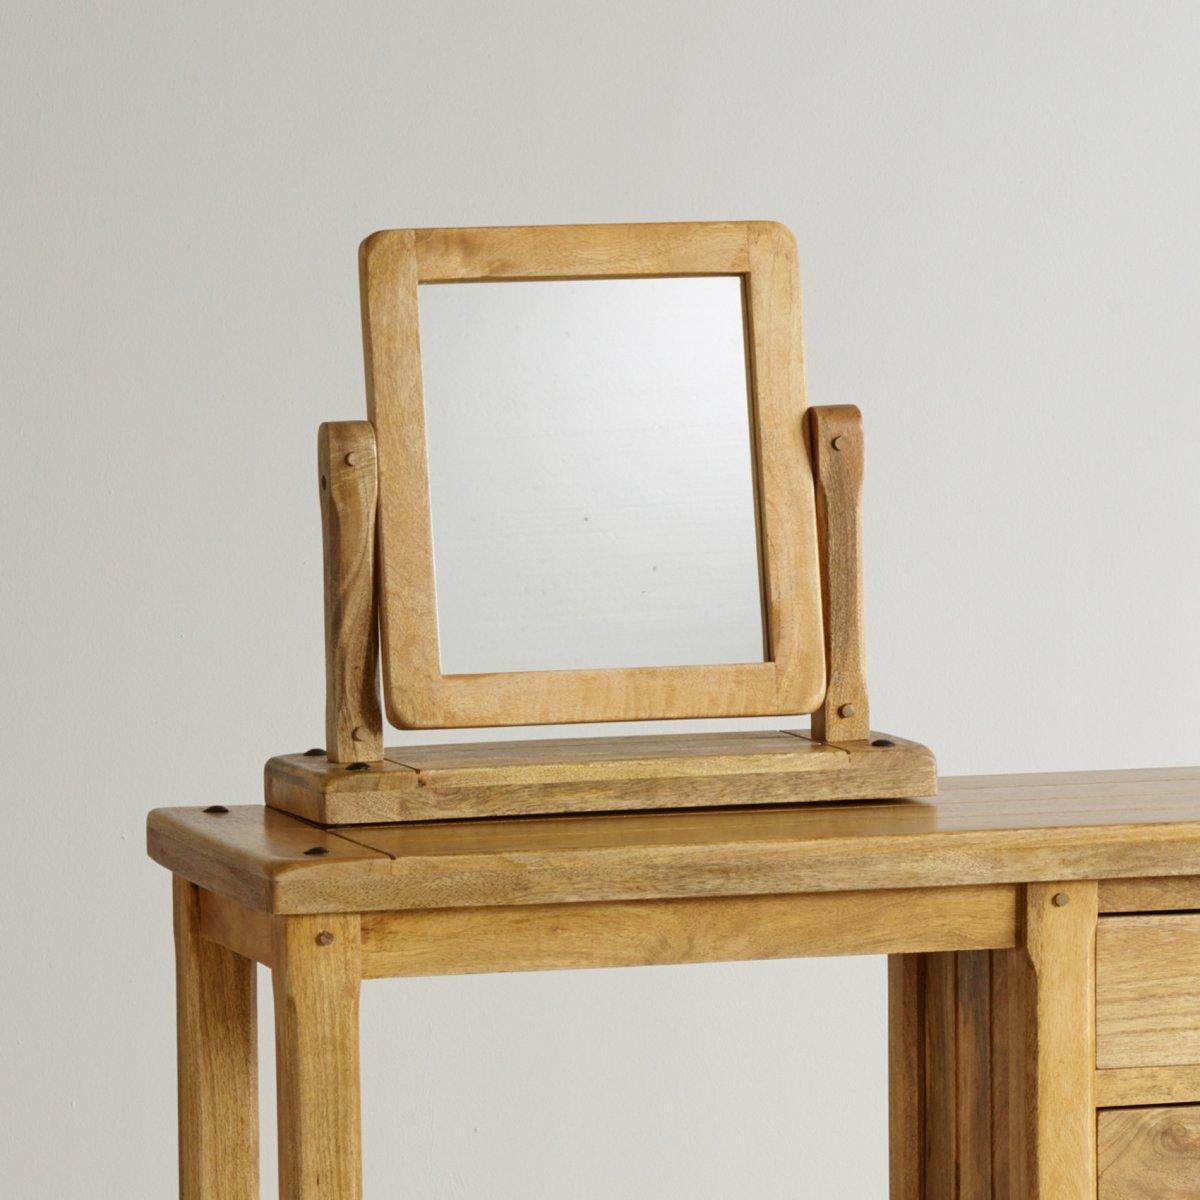 Baku Light Dressing Table Mirror In Natural Solid Mango